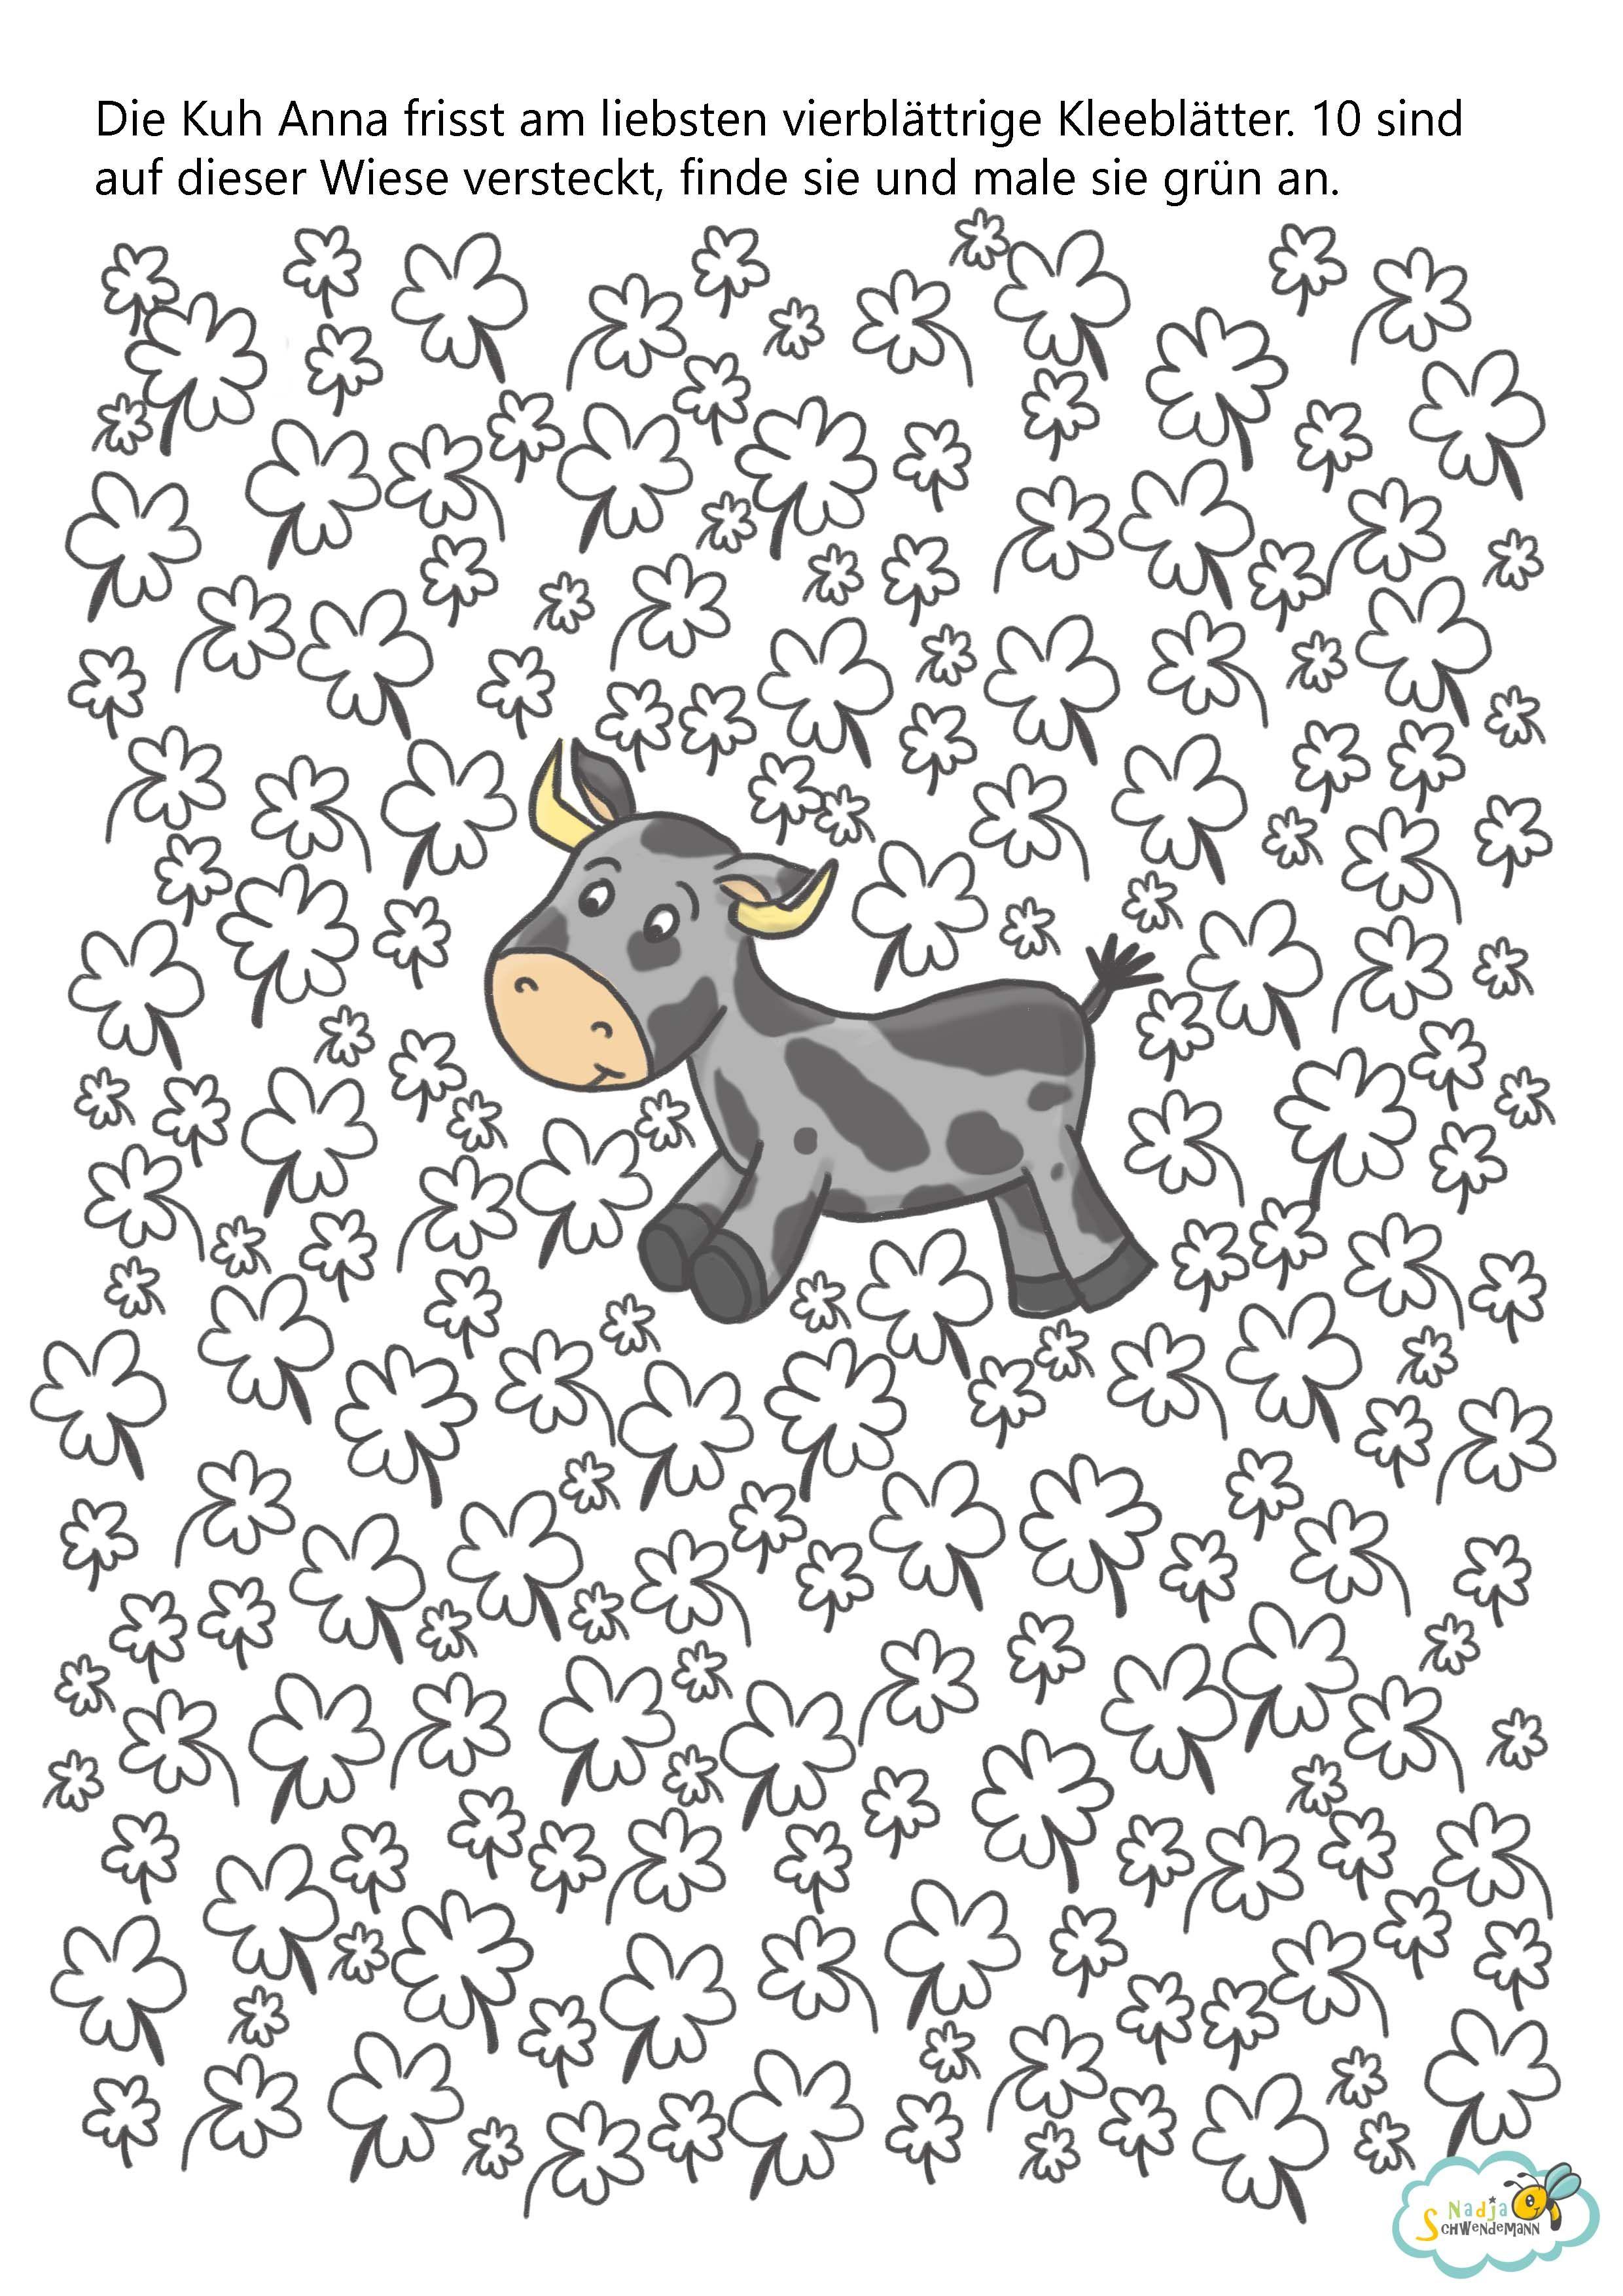 arbeitsblatt kleeblattsuche als freebie boyamalar arbeitsbl tter vorschule vorschulbl tter. Black Bedroom Furniture Sets. Home Design Ideas